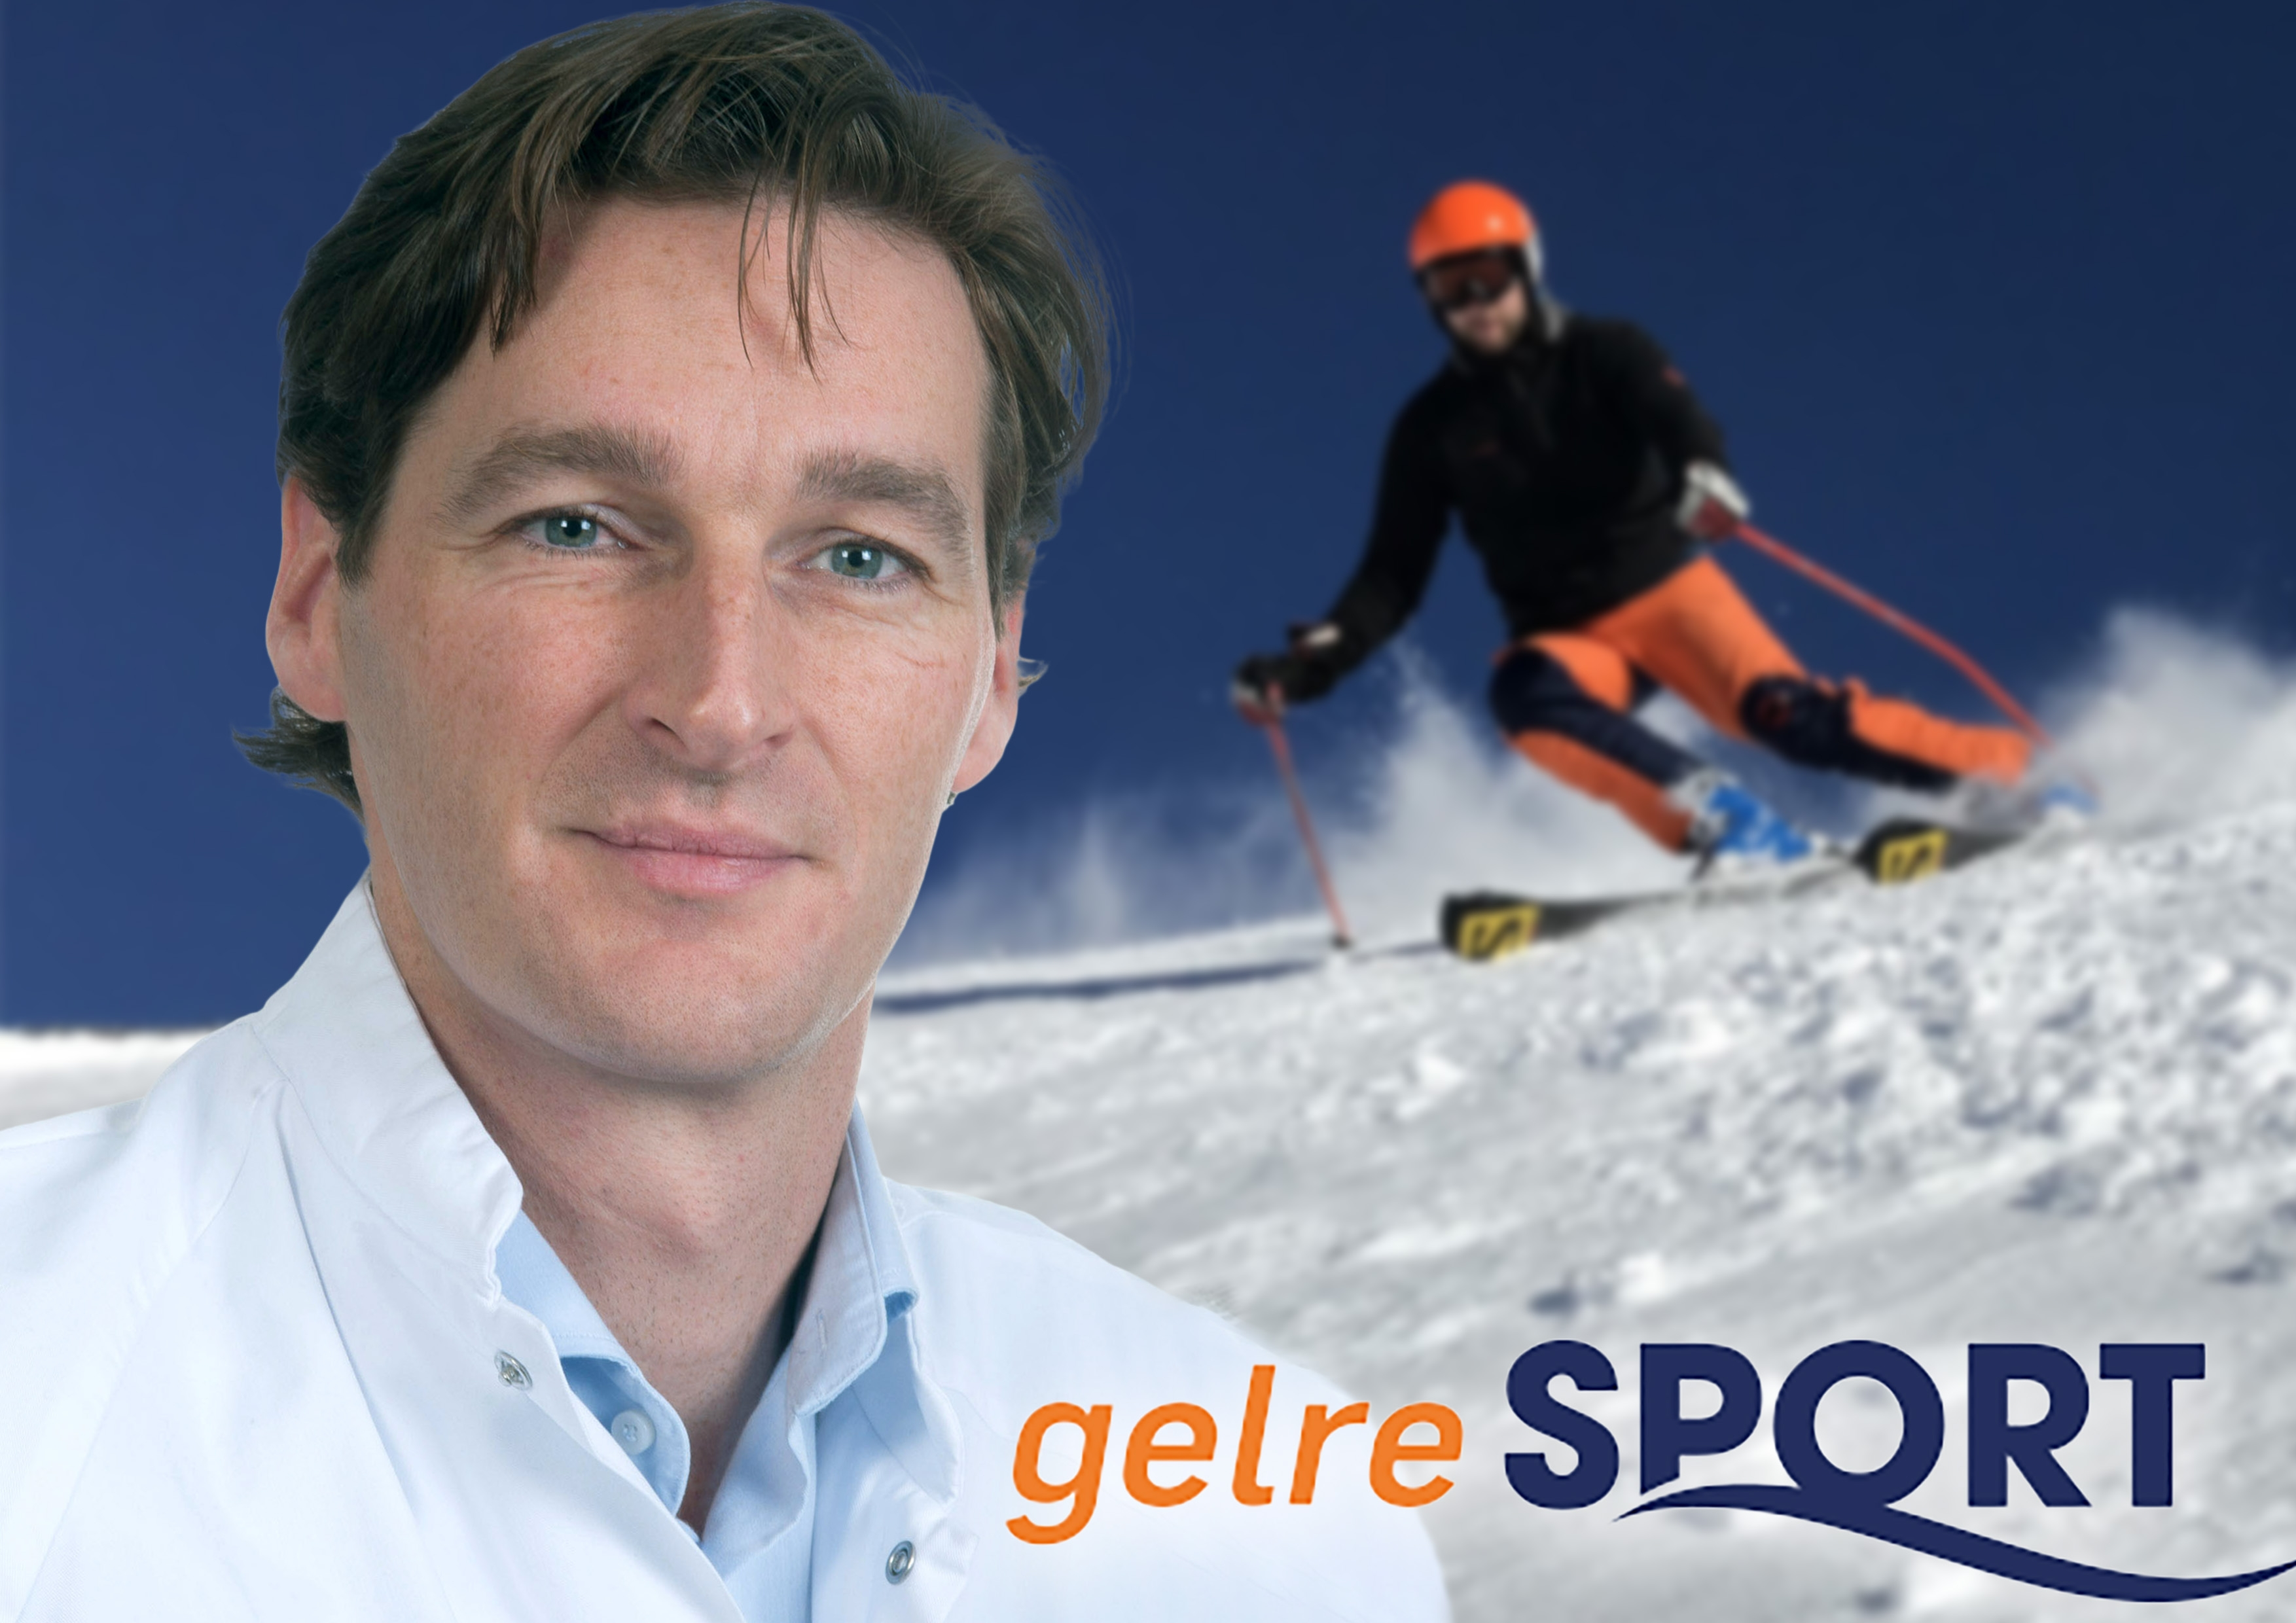 Niet te snel opereren na ski-ongeval